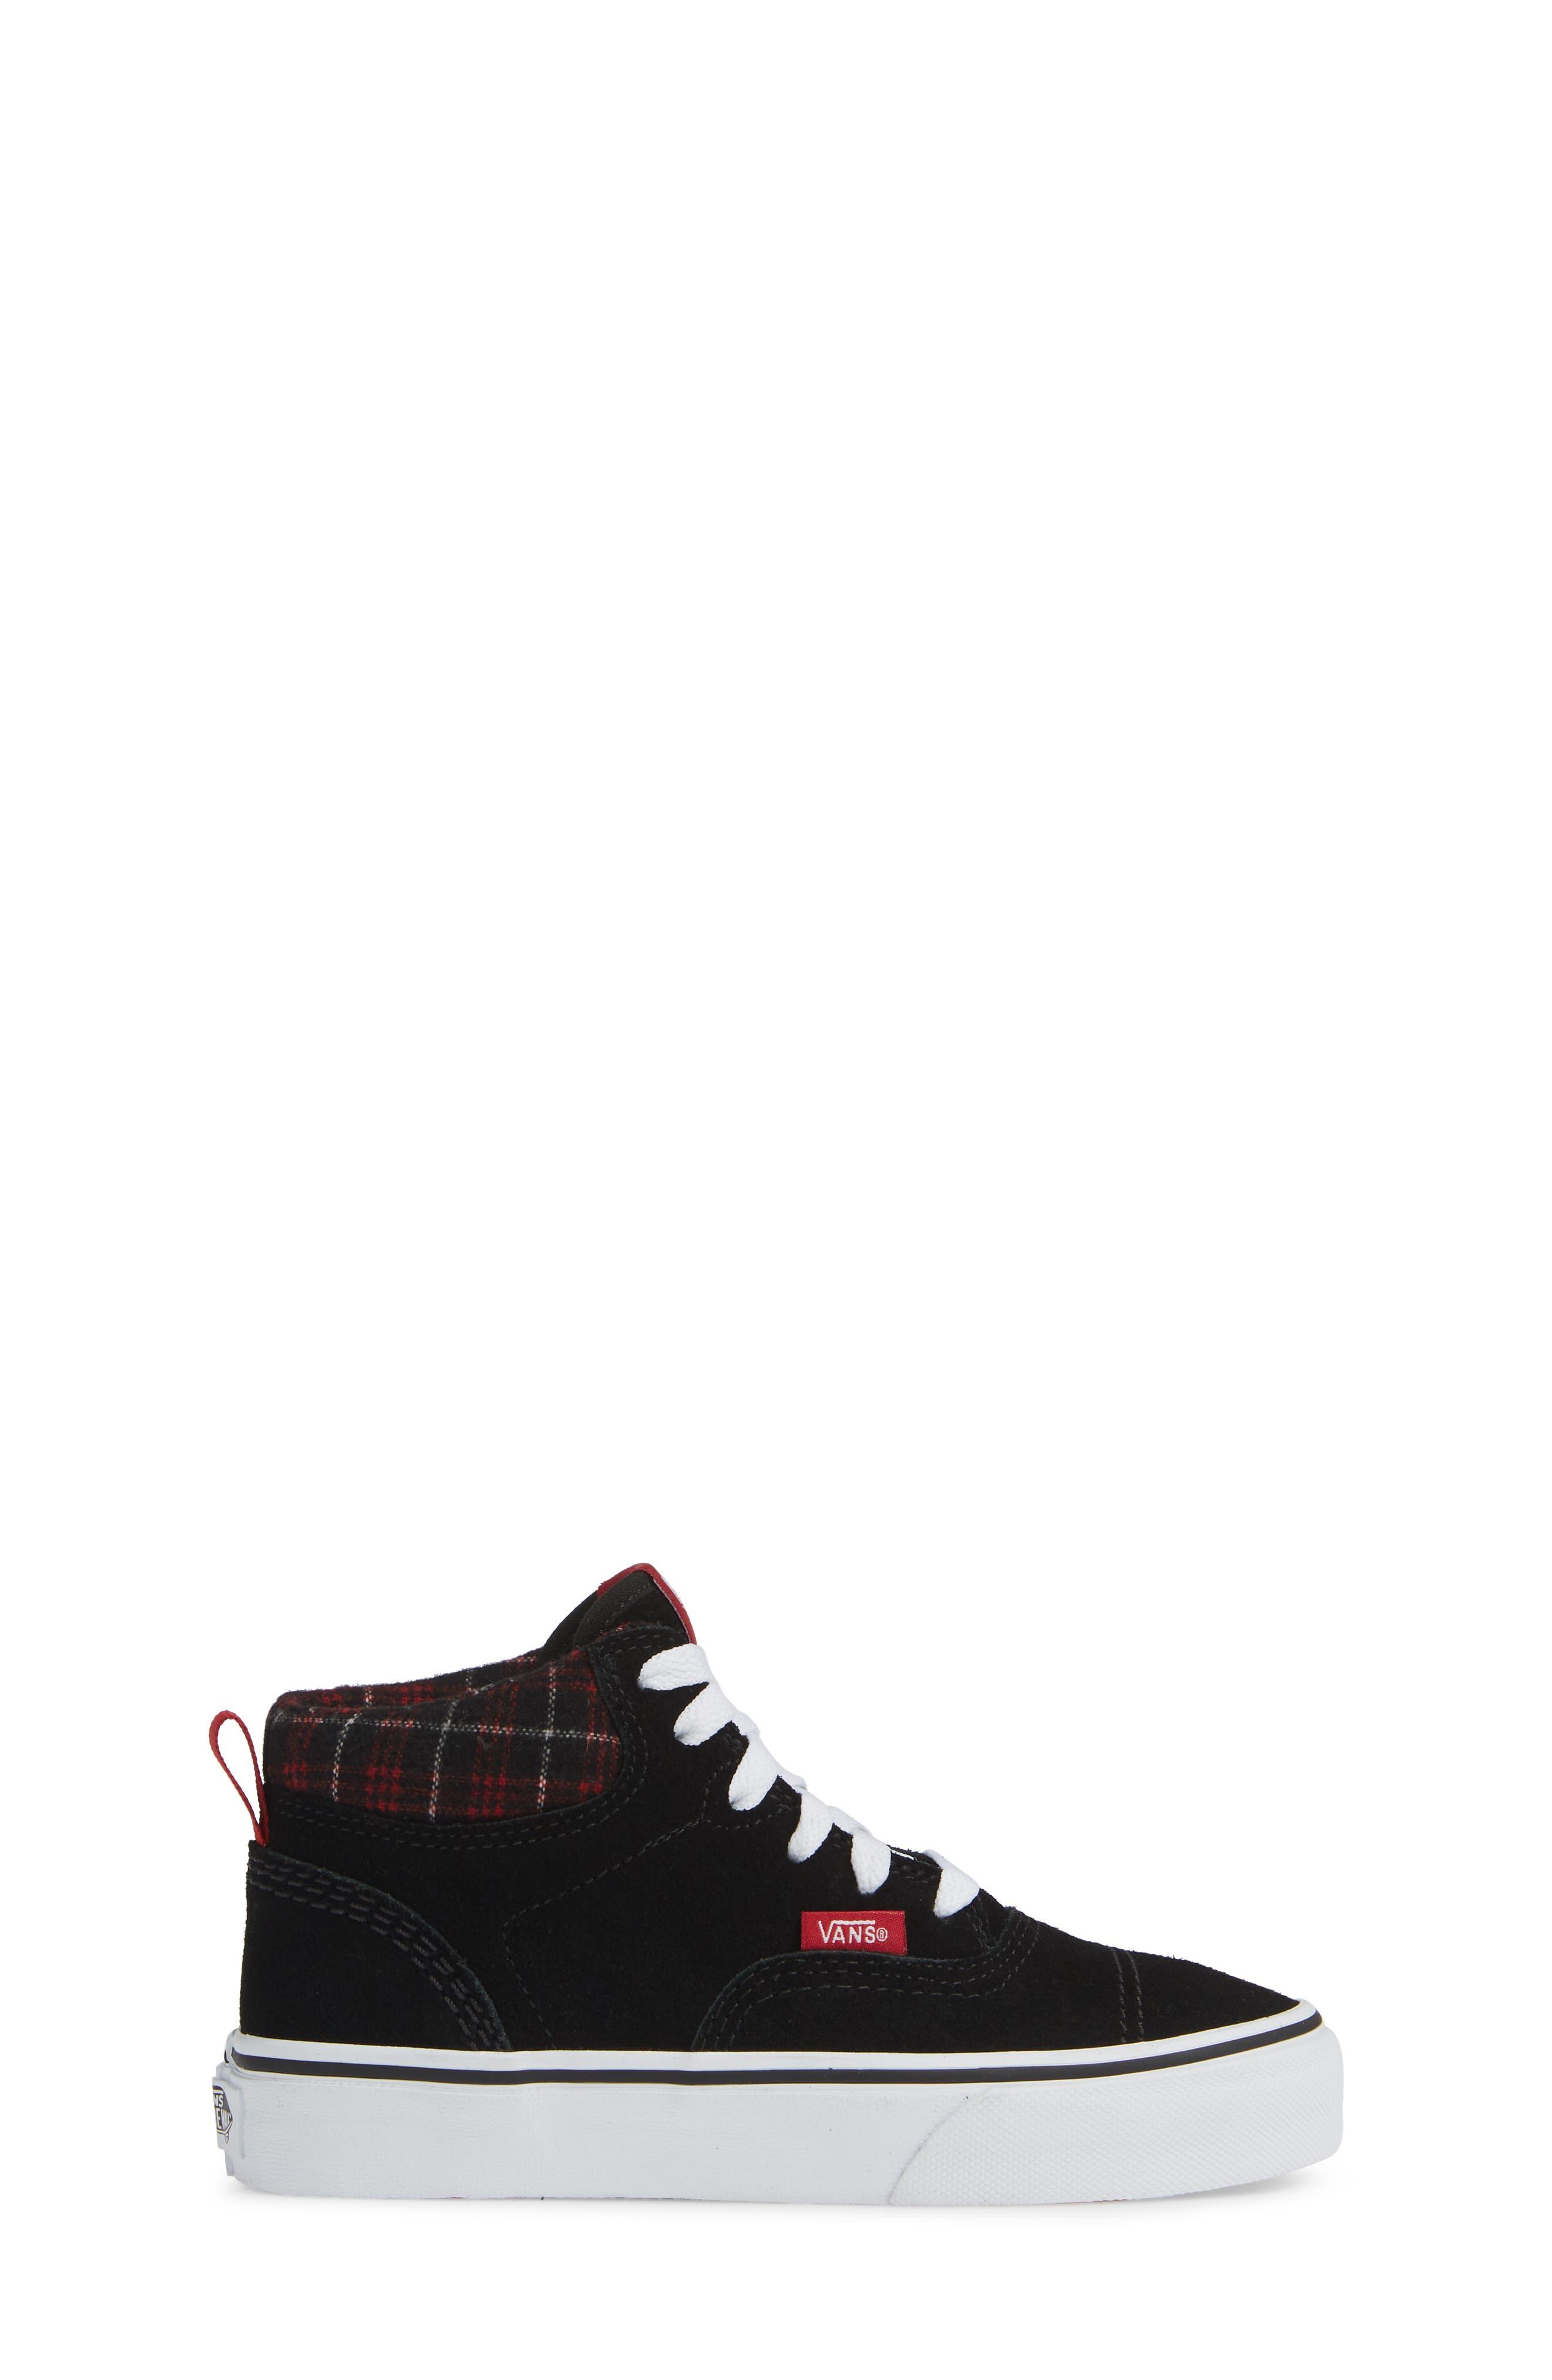 Era - Hi Sneaker,                             Alternate thumbnail 3, color,                             SUEDE AND PLAID BLACK/ WHITE